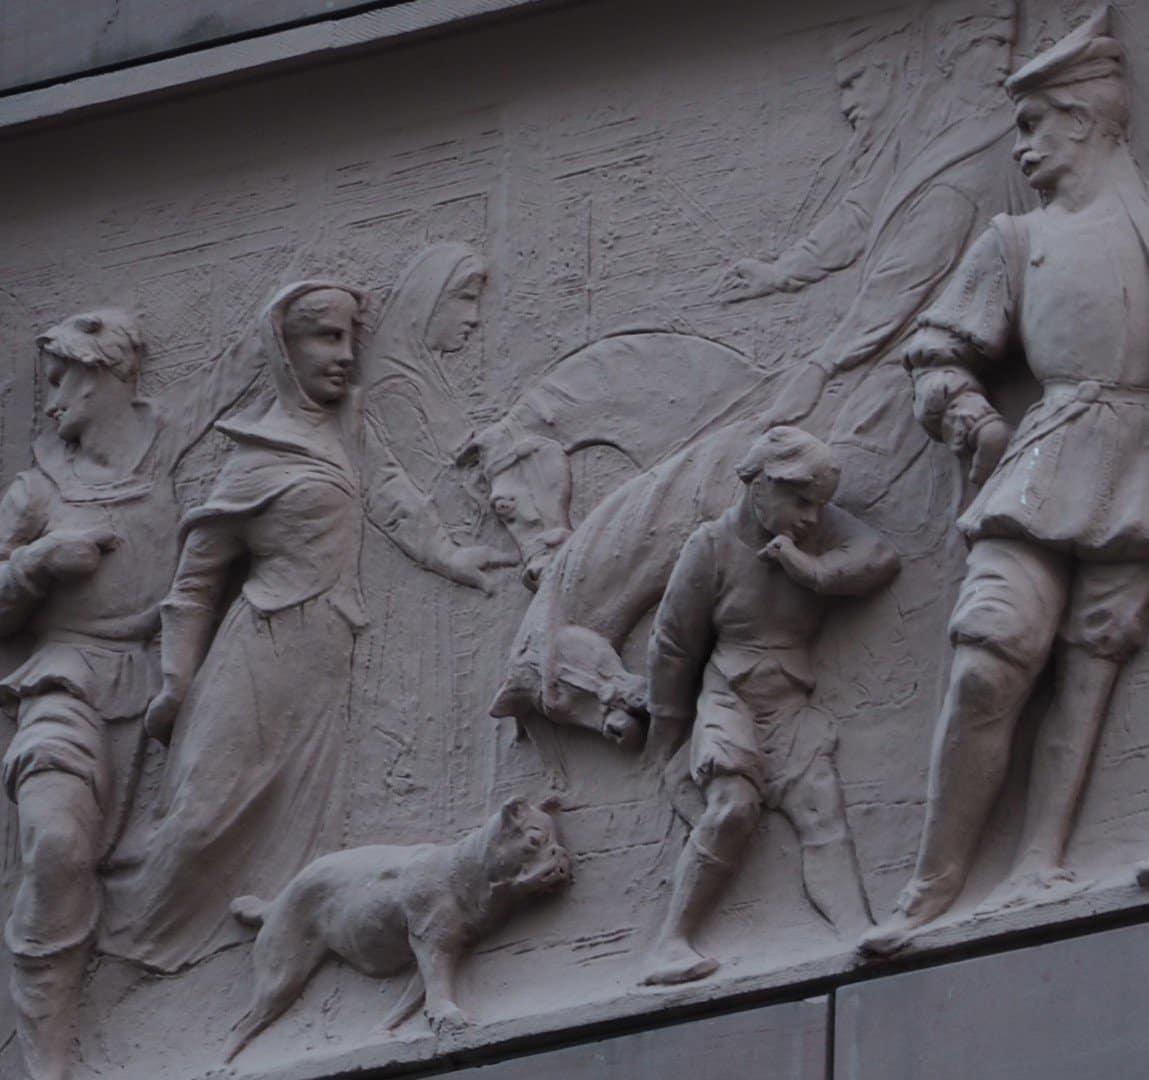 City of London Animals - Dogs